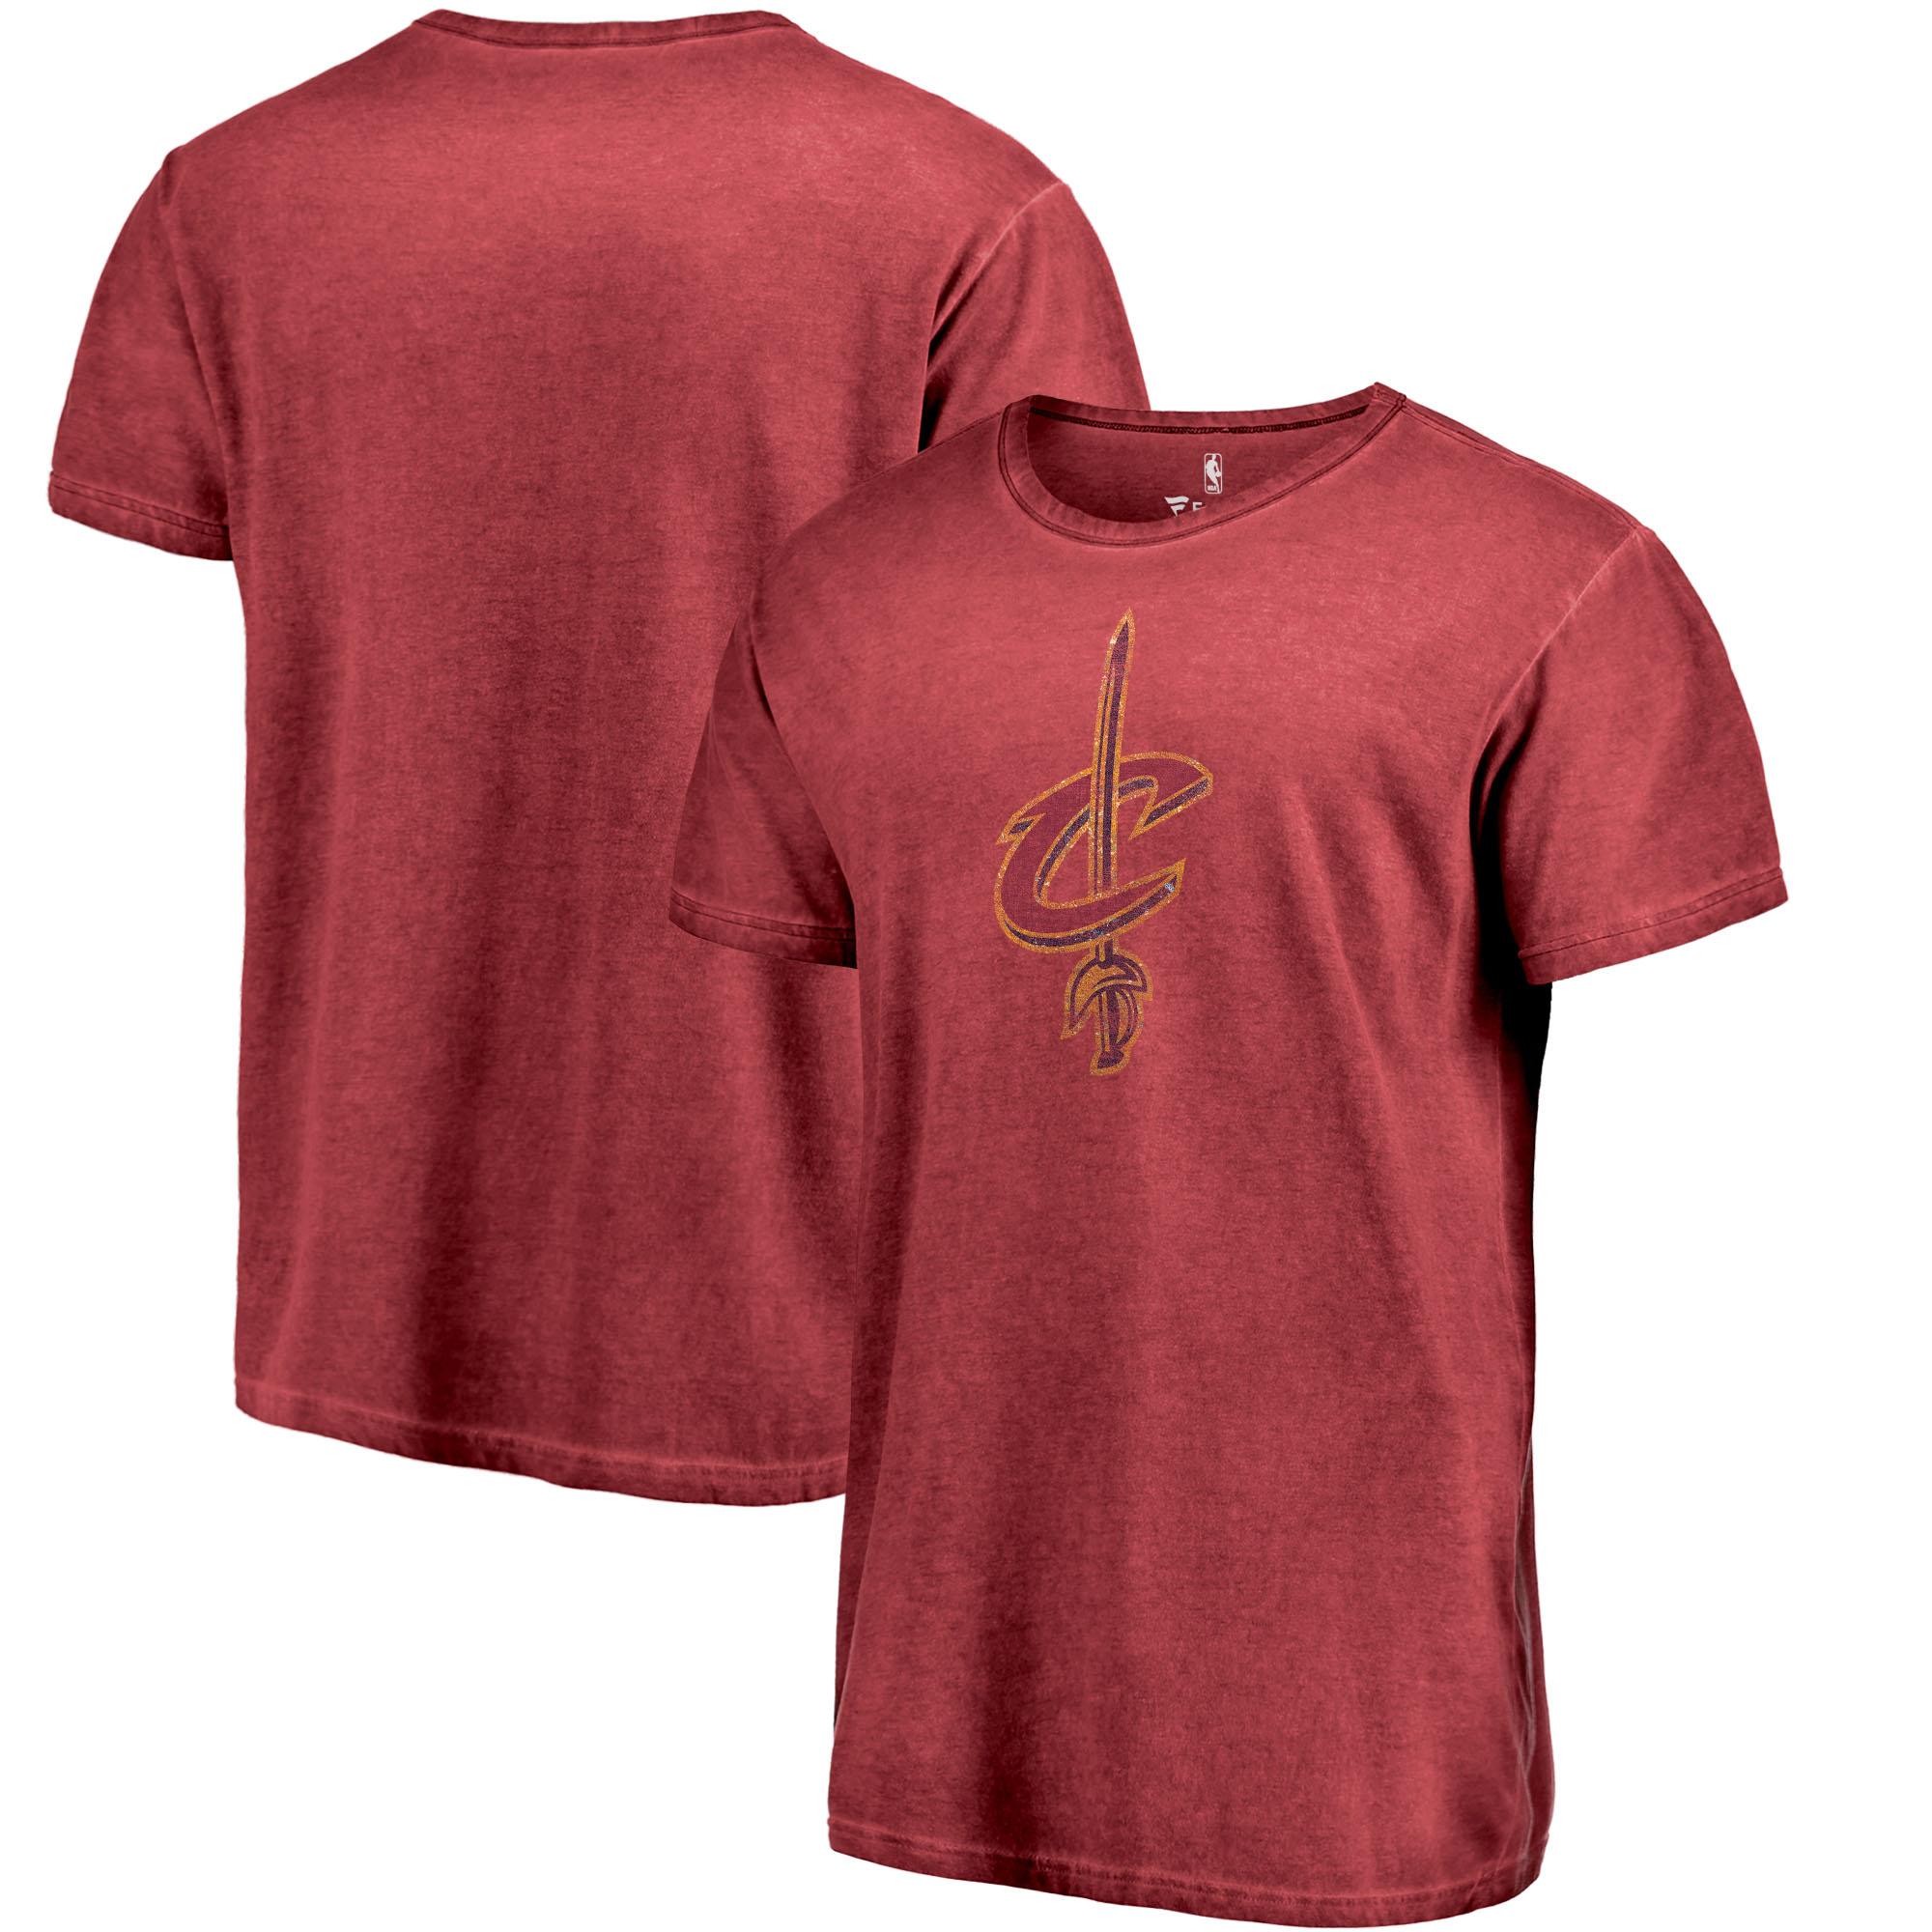 Cleveland Cavaliers Fanatics Branded Shadow Washed Logo T-Shirt - Garnet